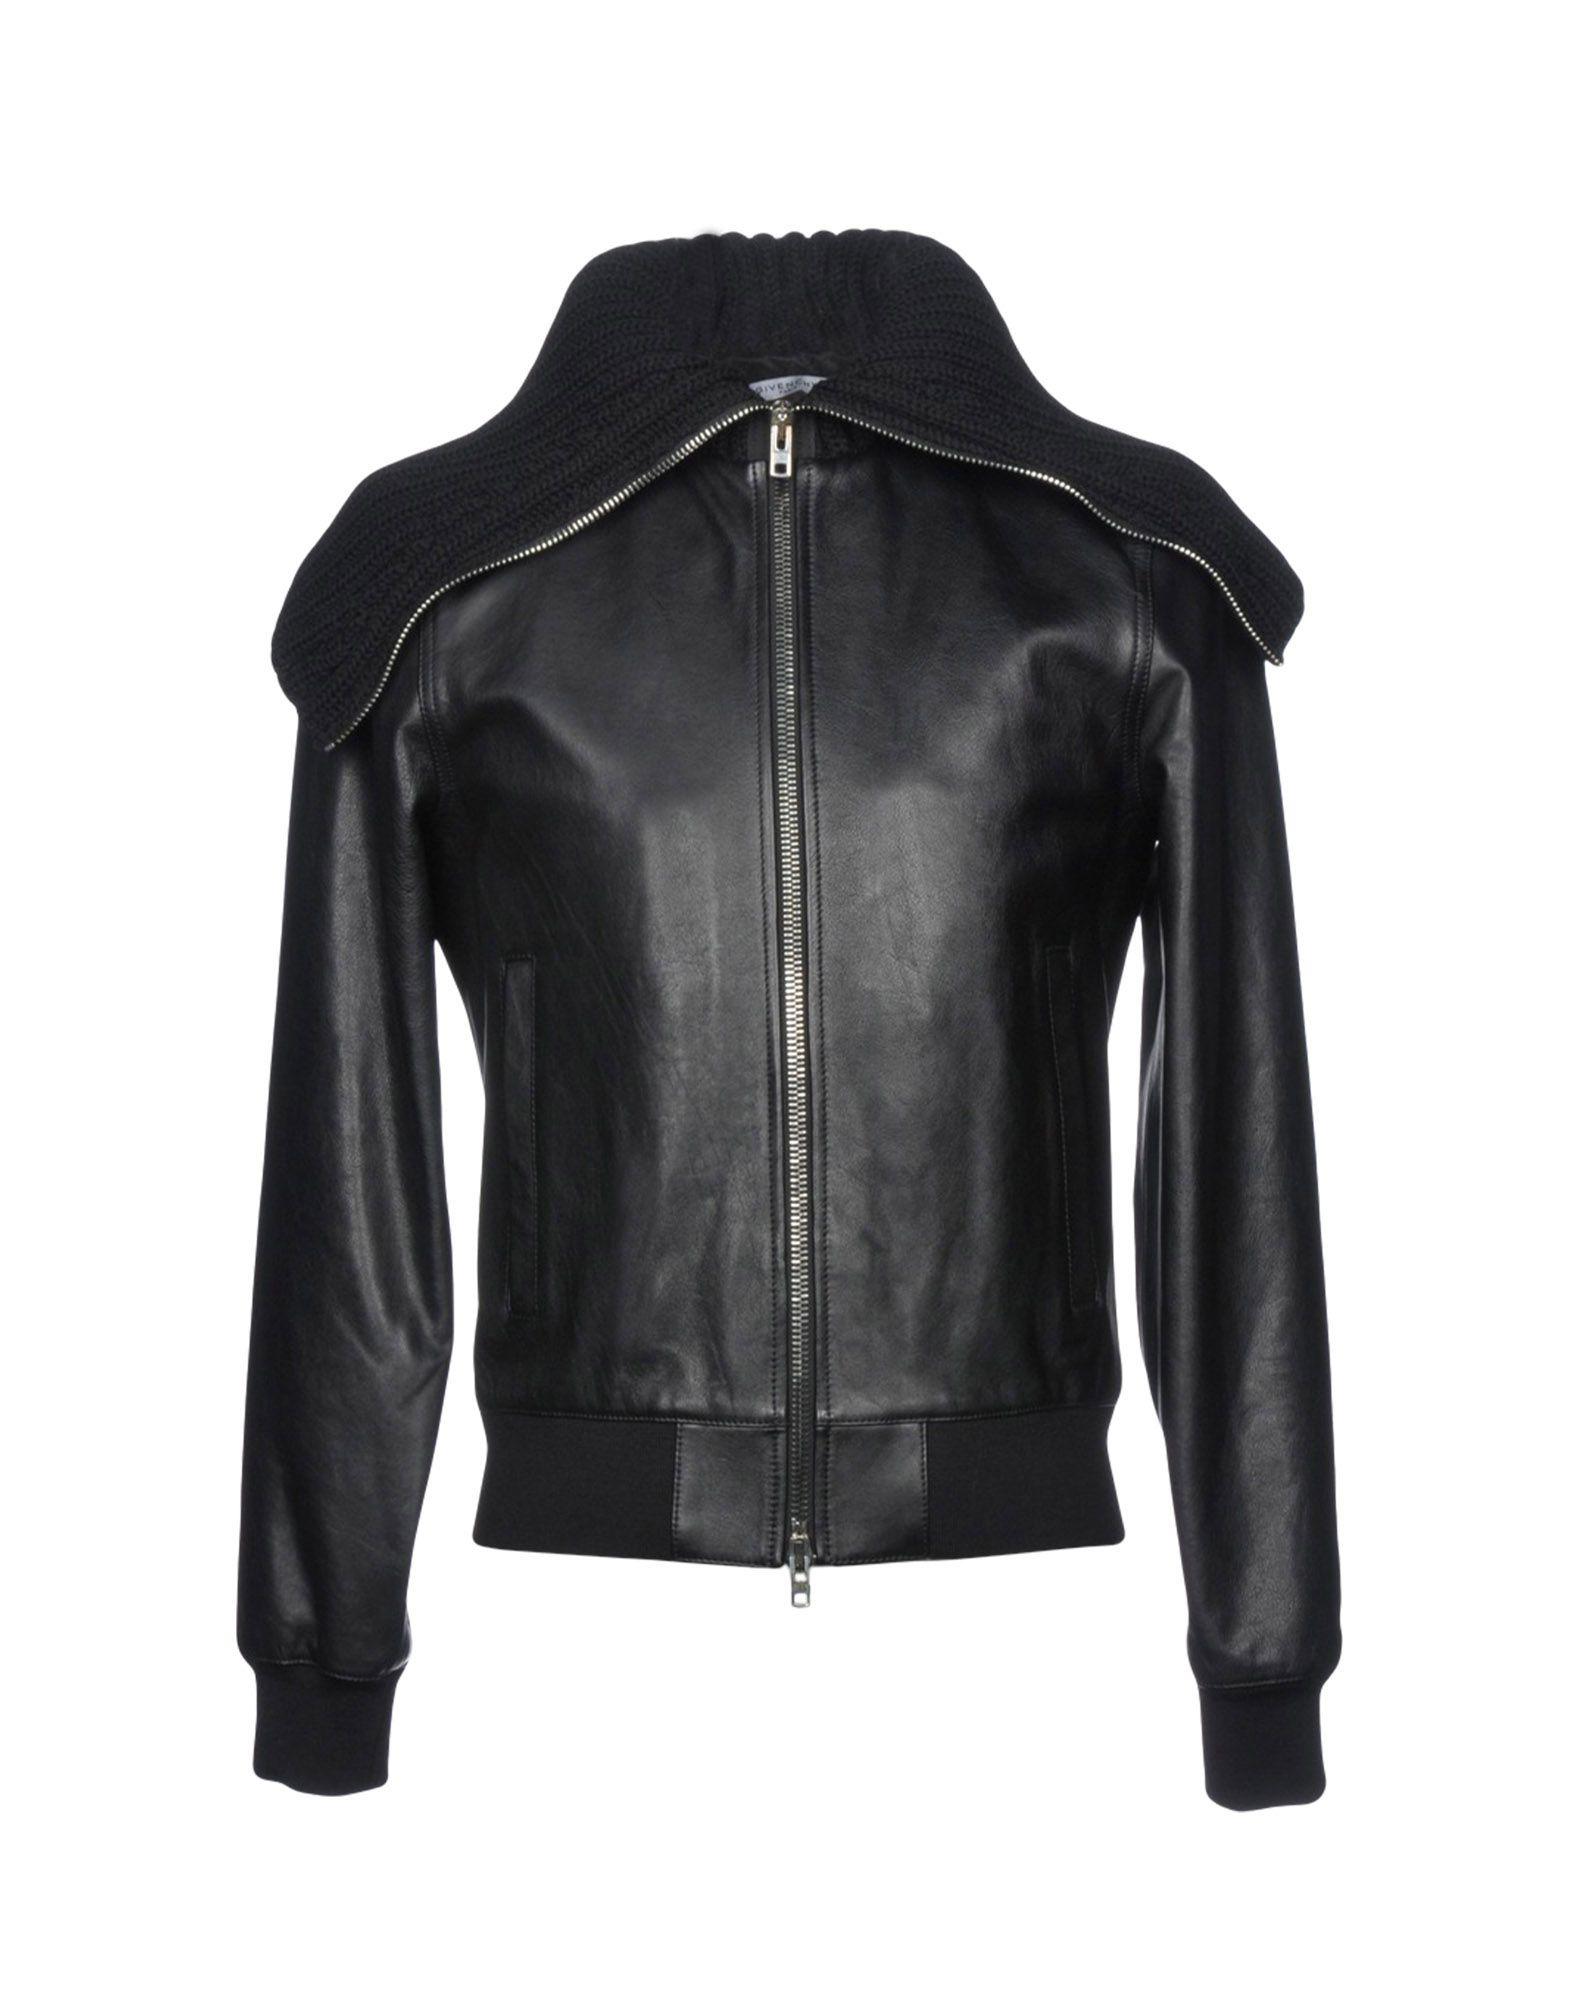 Giubbotto Pelle Givenchy Donna - Acquista online su